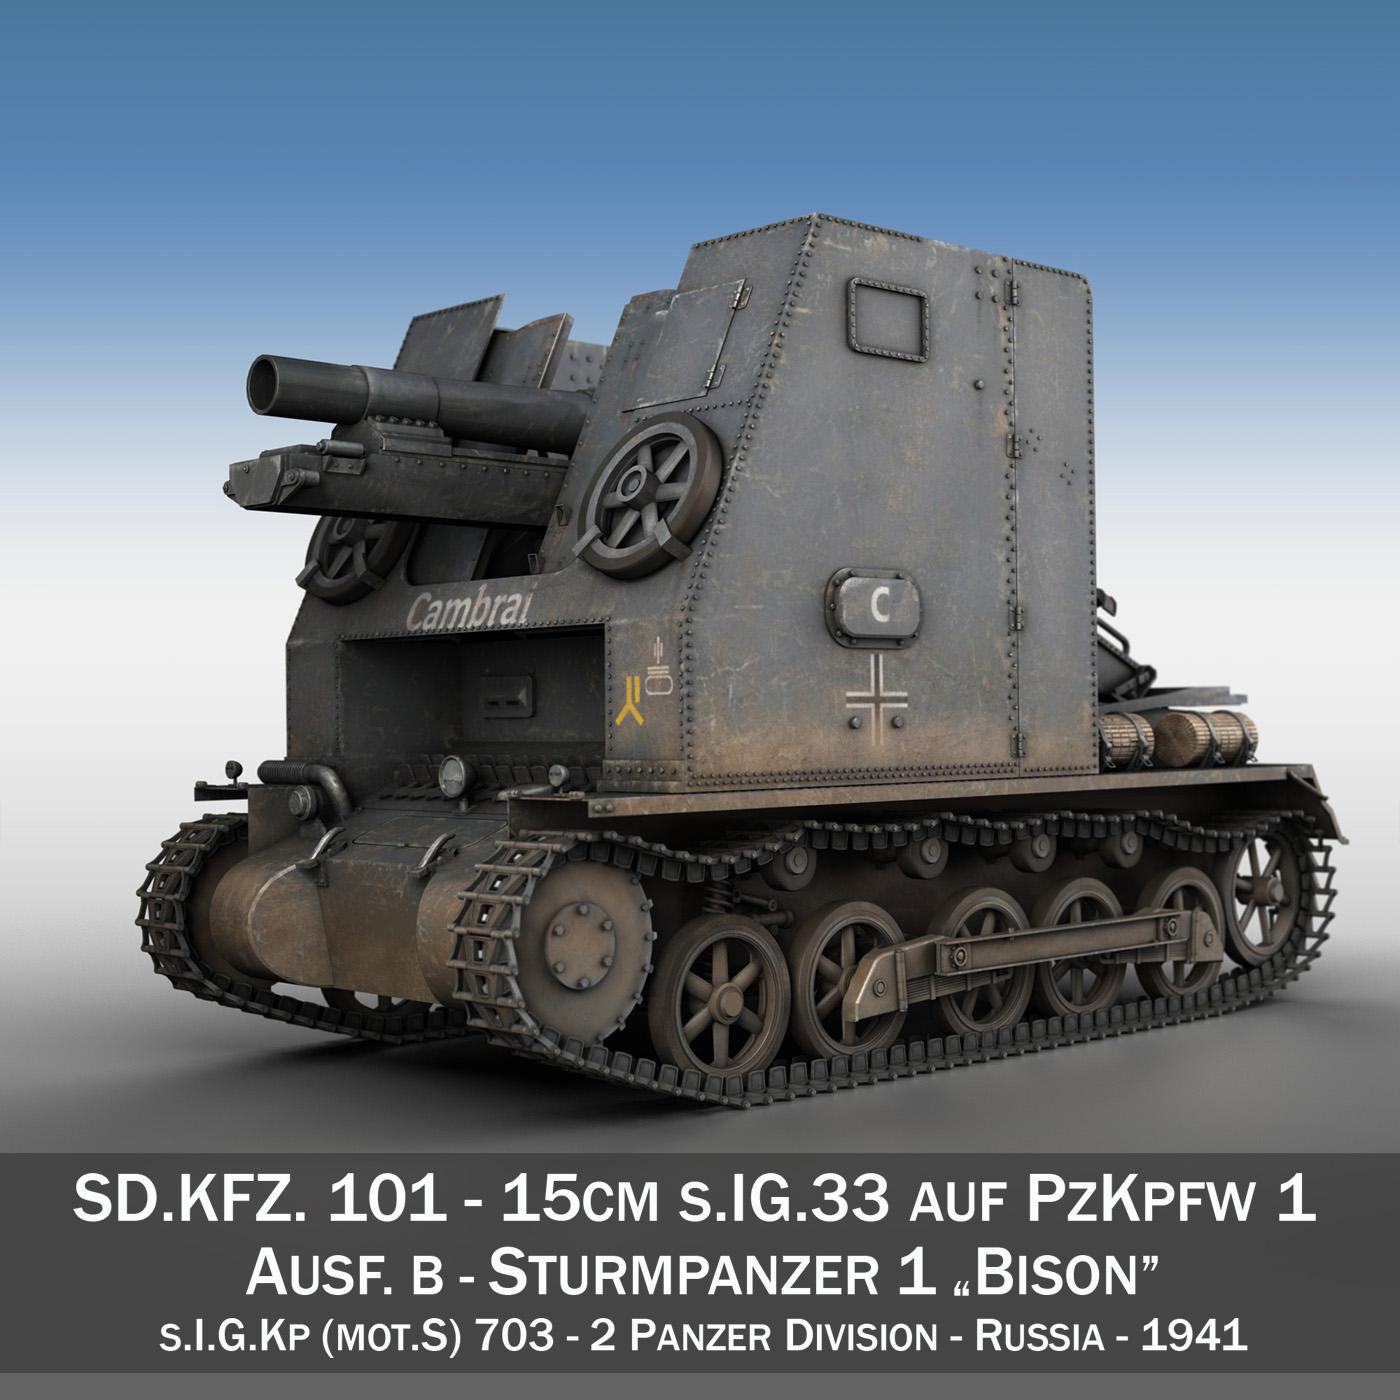 sturmpanzer1 - bison - cambrai- 2.pzdiv Samhail 3d 3ds fbx c4d lwo obj 191337